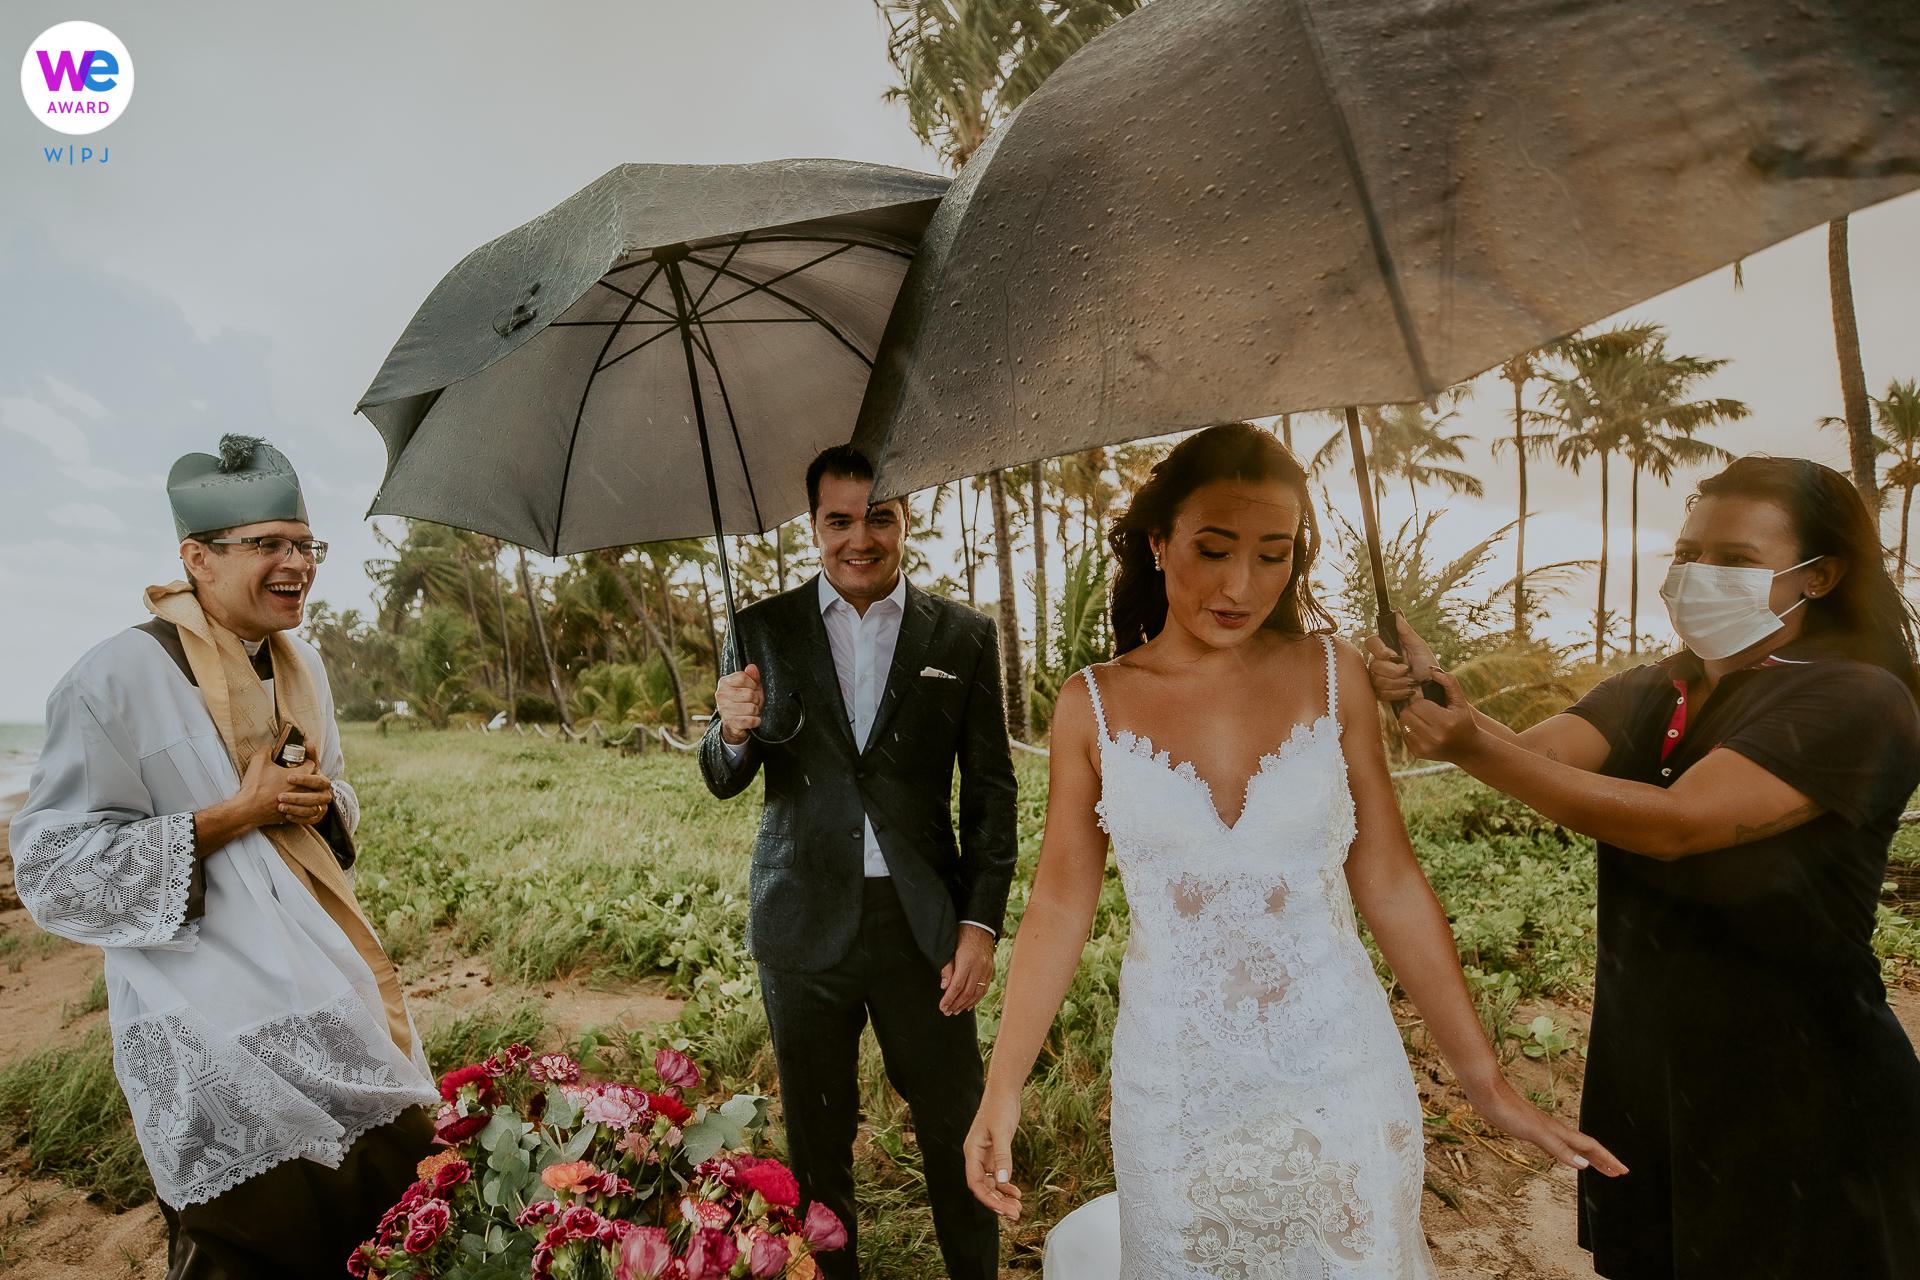 Beach wedding photography | shielded from the rain, the bride walks gracefully along the beach